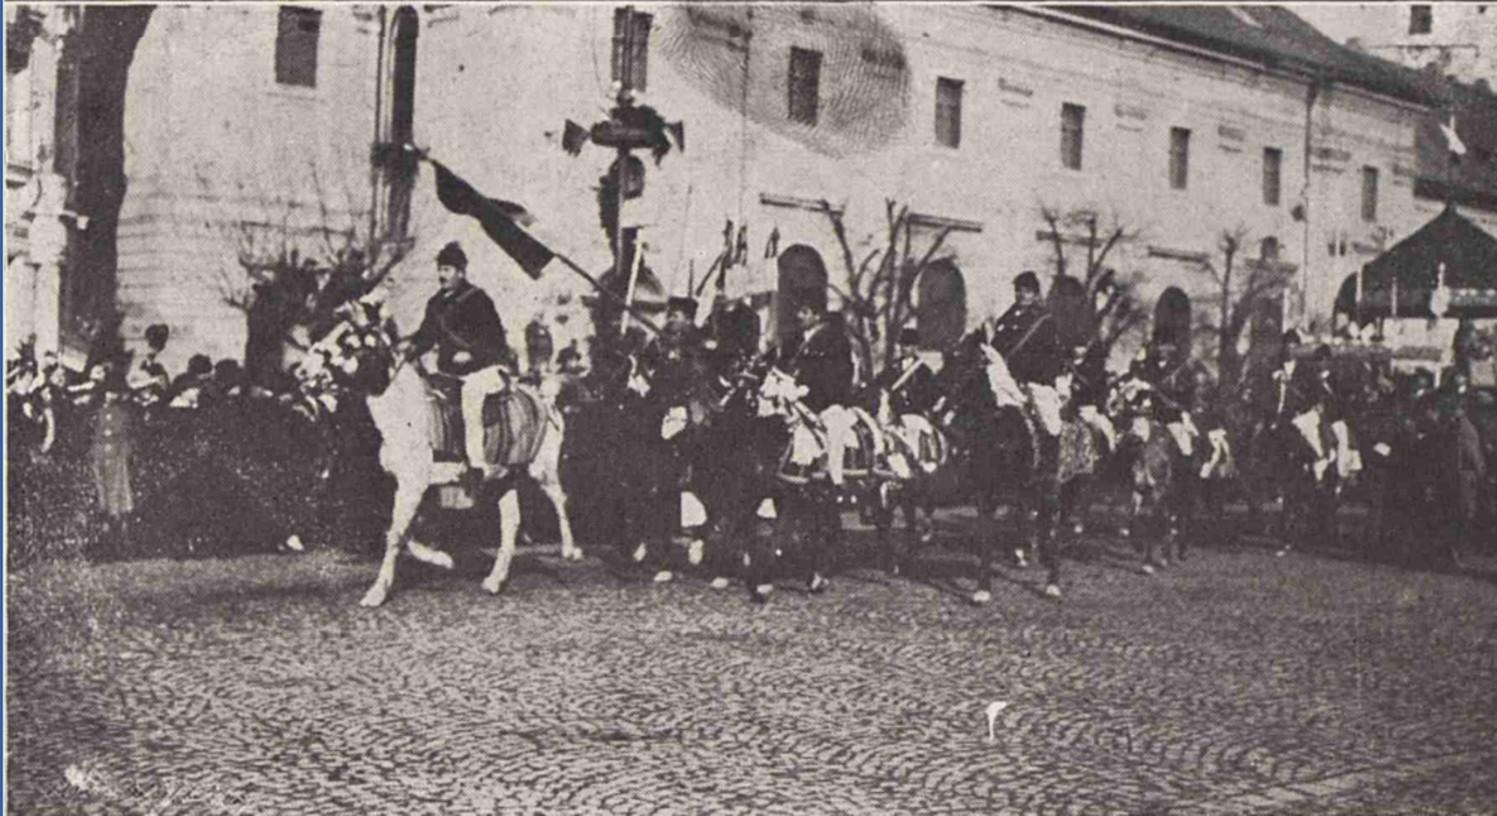 Gral Berthelot in Ardeal LUCEAFARUL 4 1919 ian 15